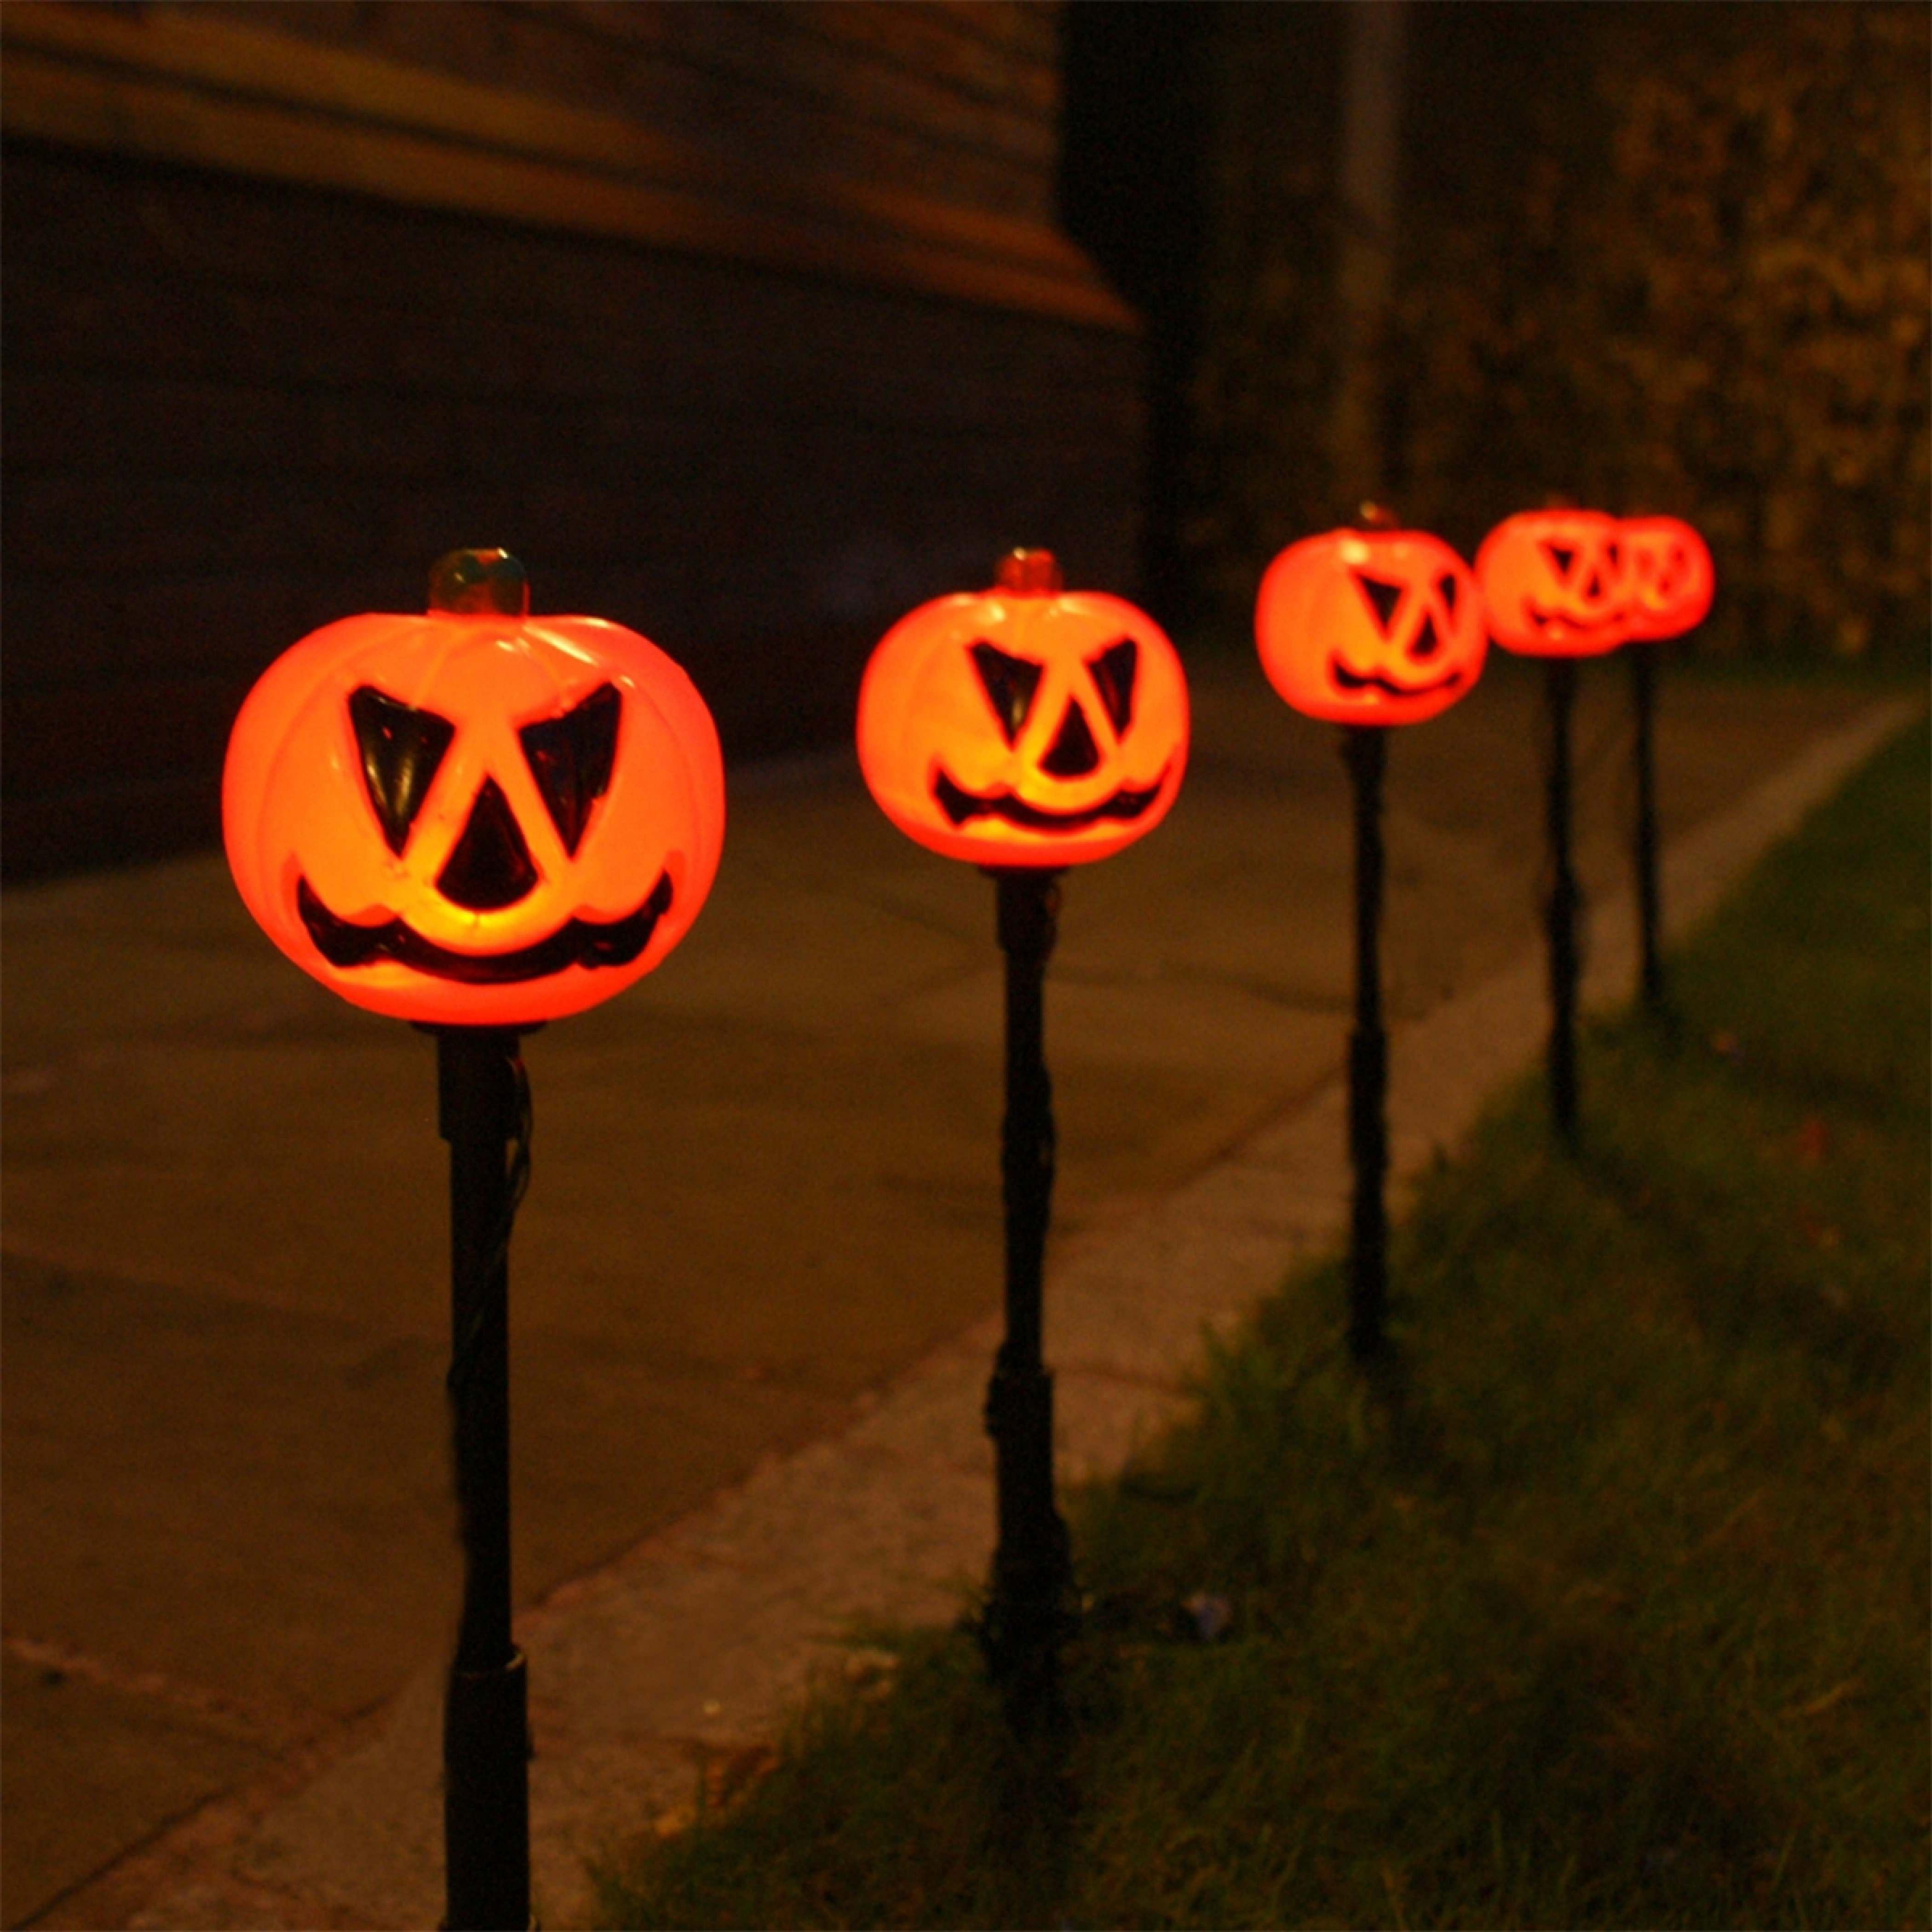 5 Outdoor Halloween Pumpkin Stake Lights, Orange Leds With Regard To Popular Outdoor Pumpkin Lanterns (Gallery 19 of 20)